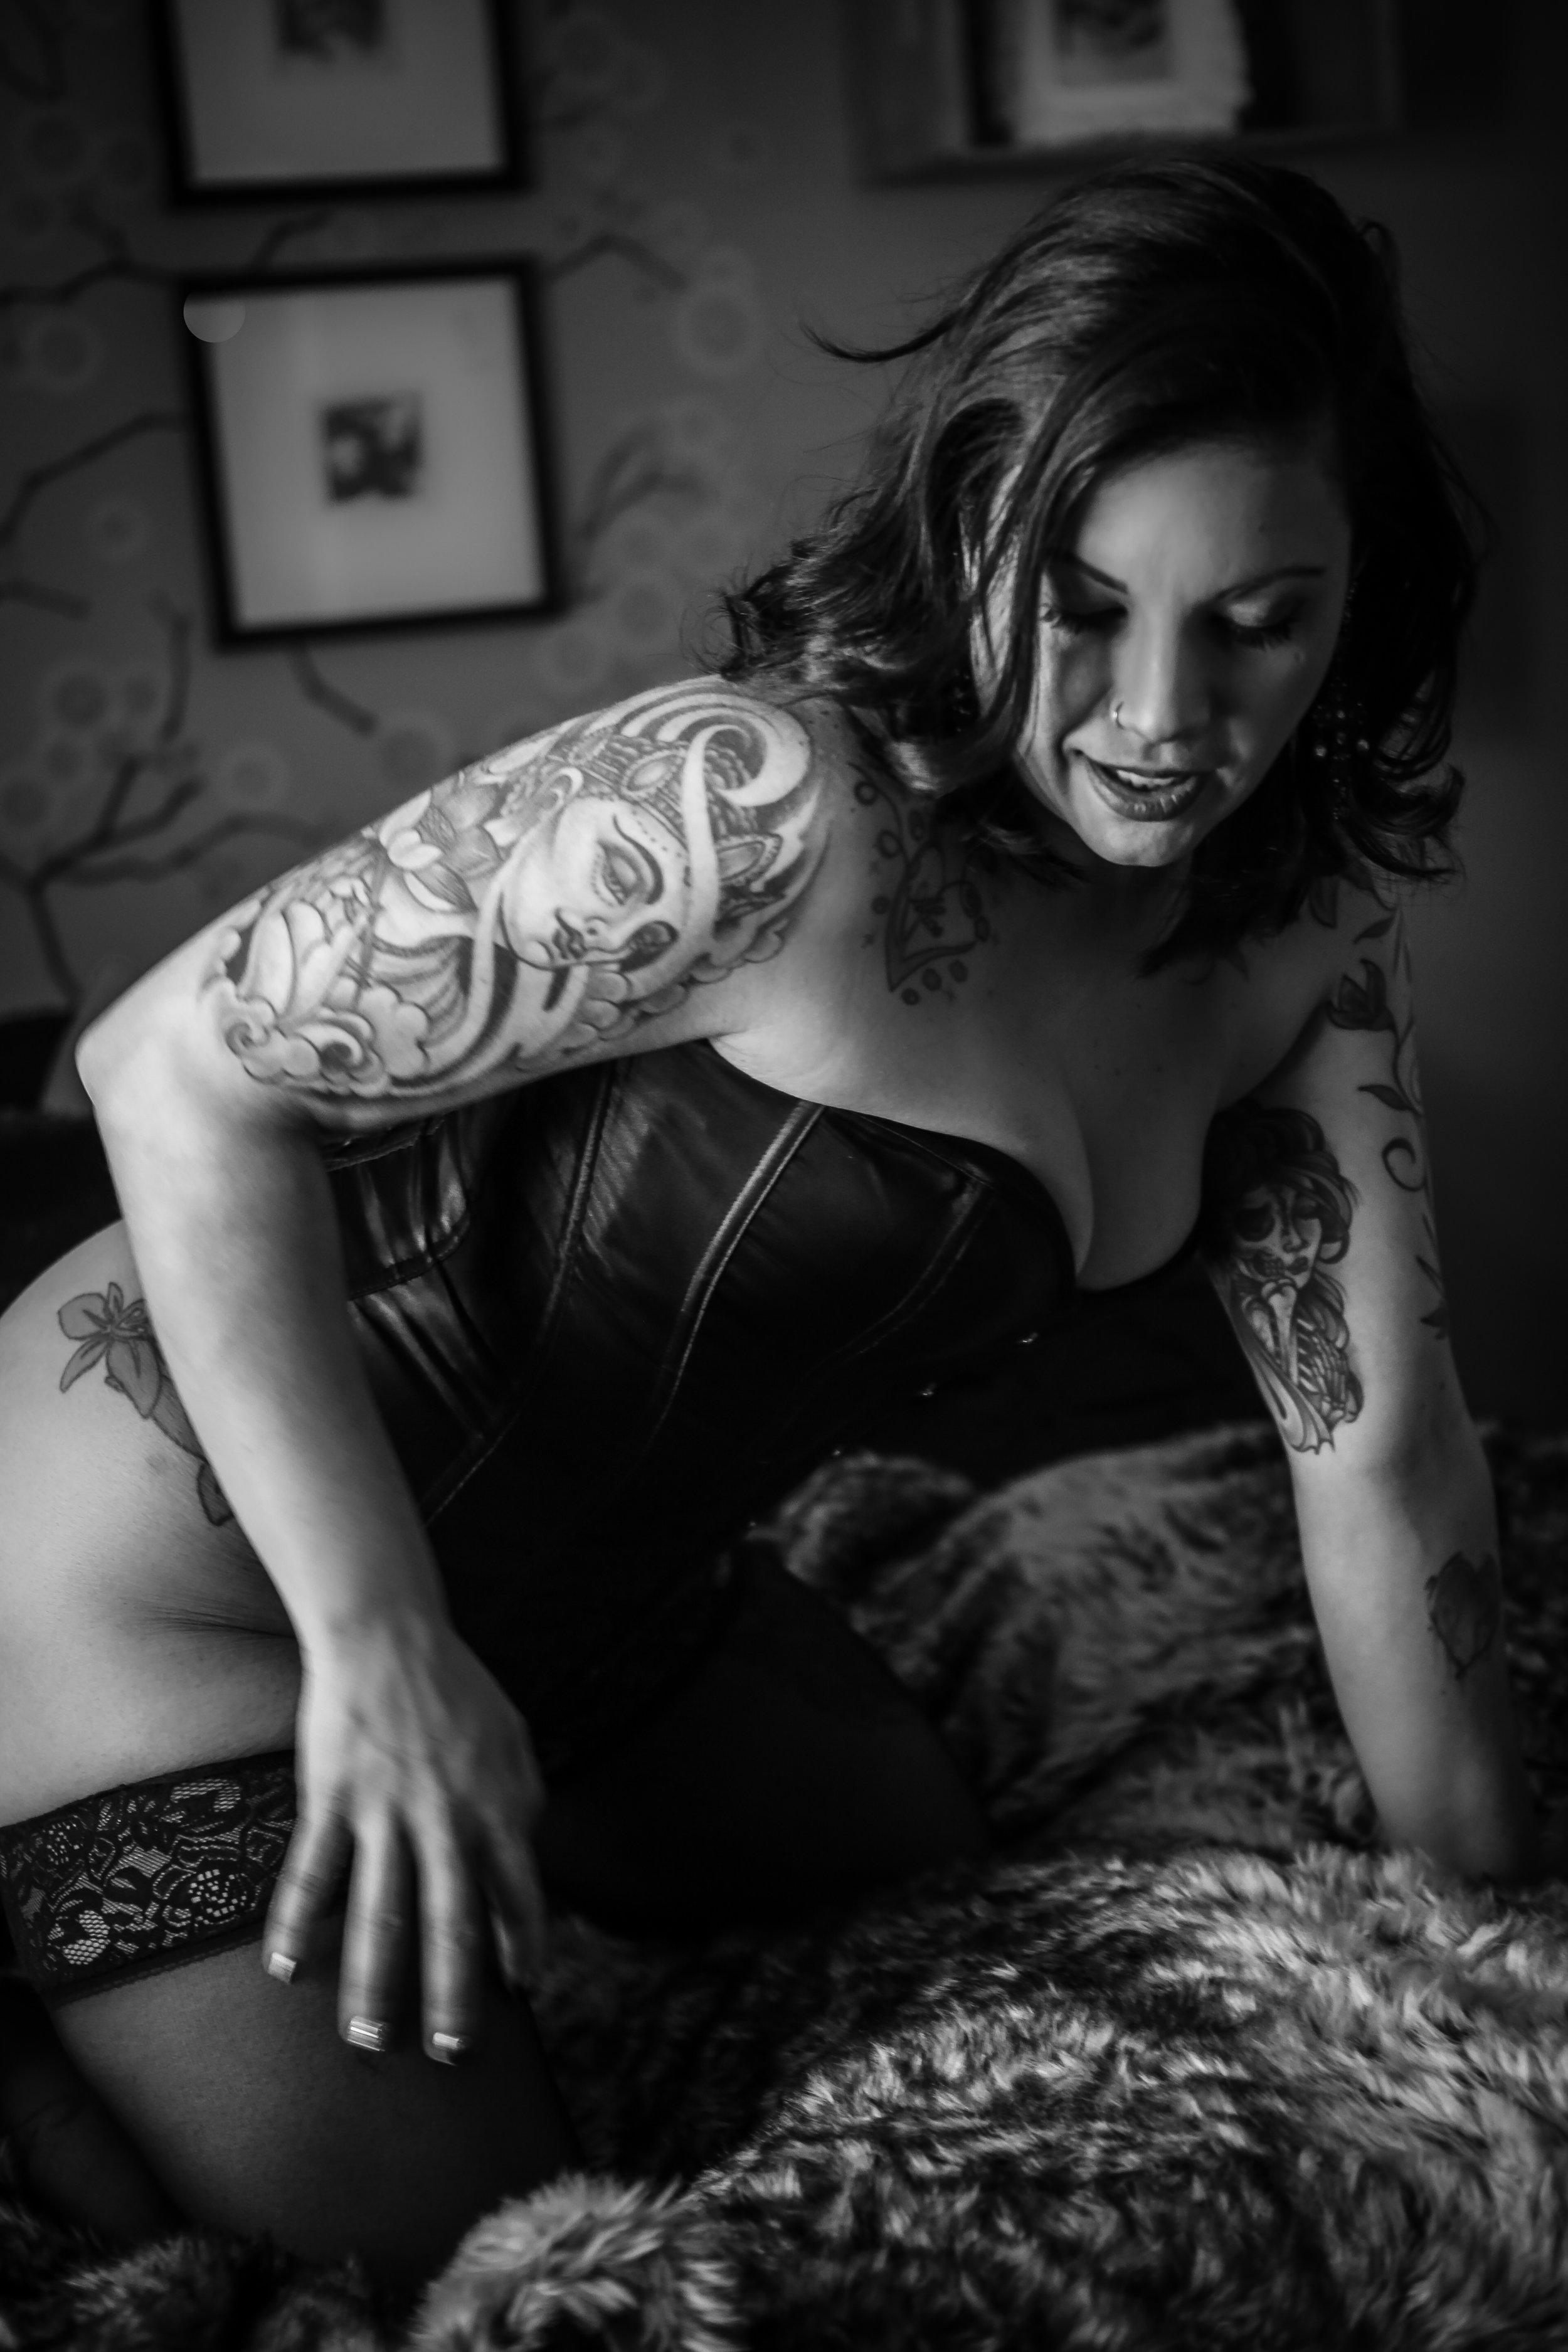 Ana sexy (6 of 20).jpg